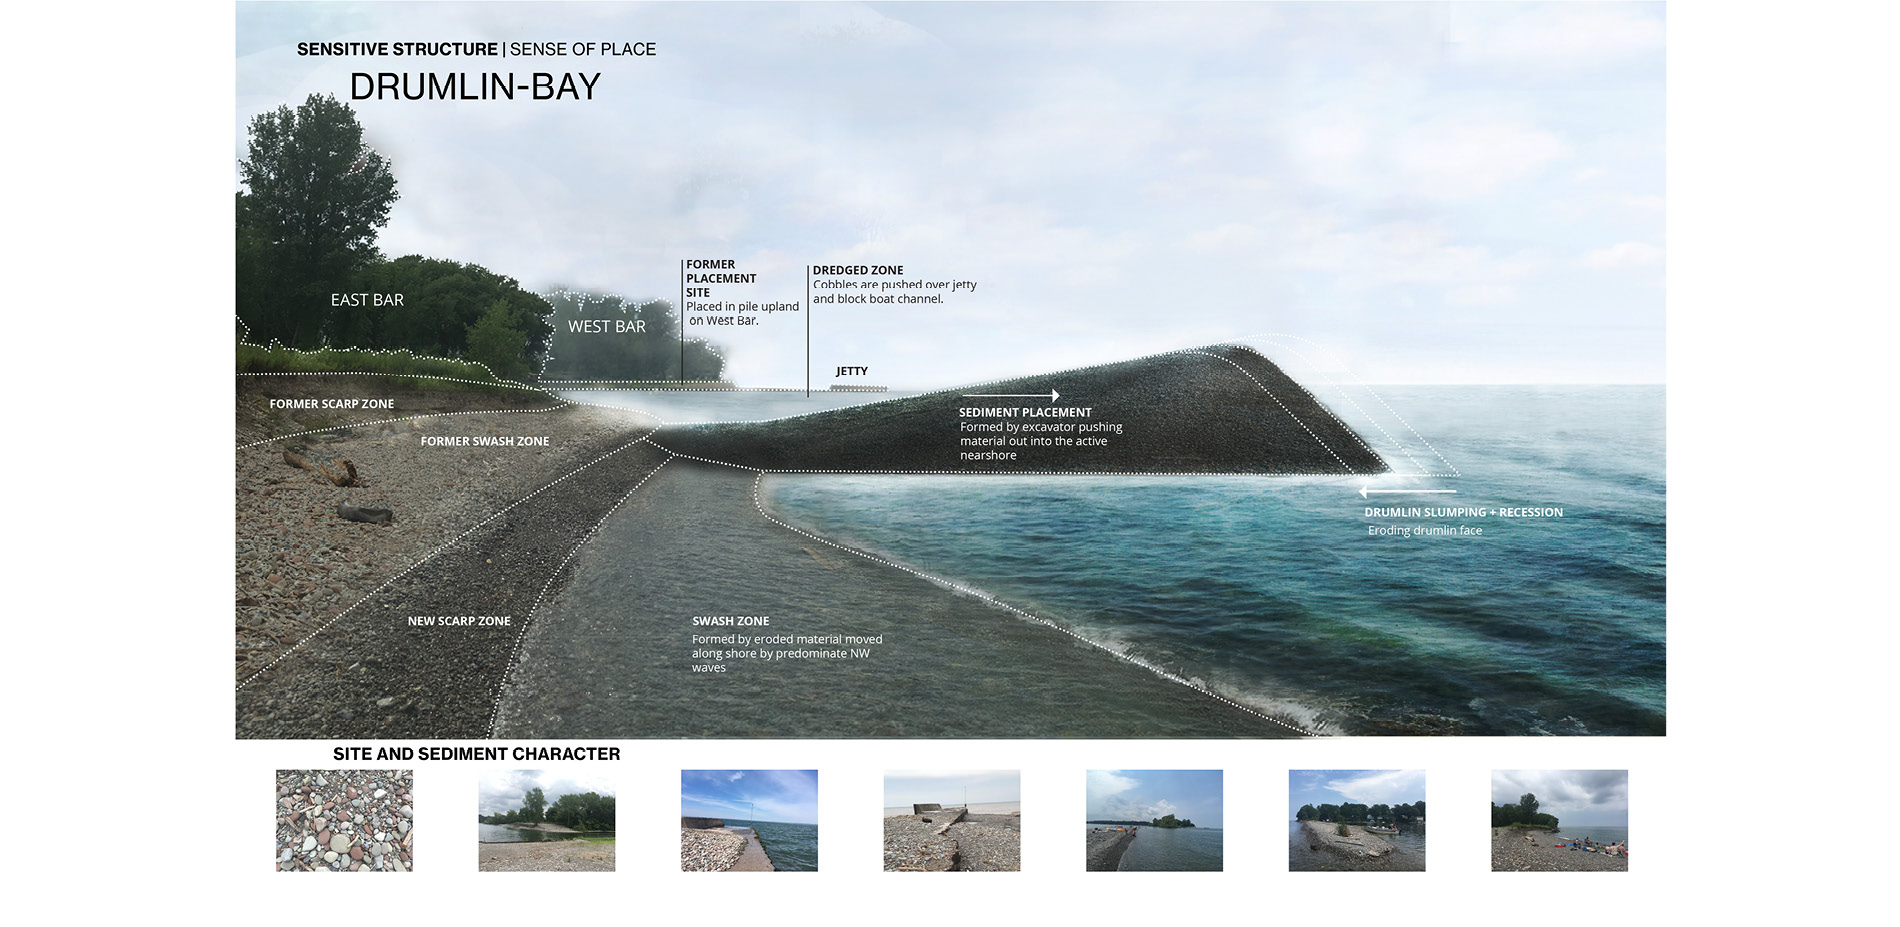 Drumlin Bay Complex: Sensitive Structure